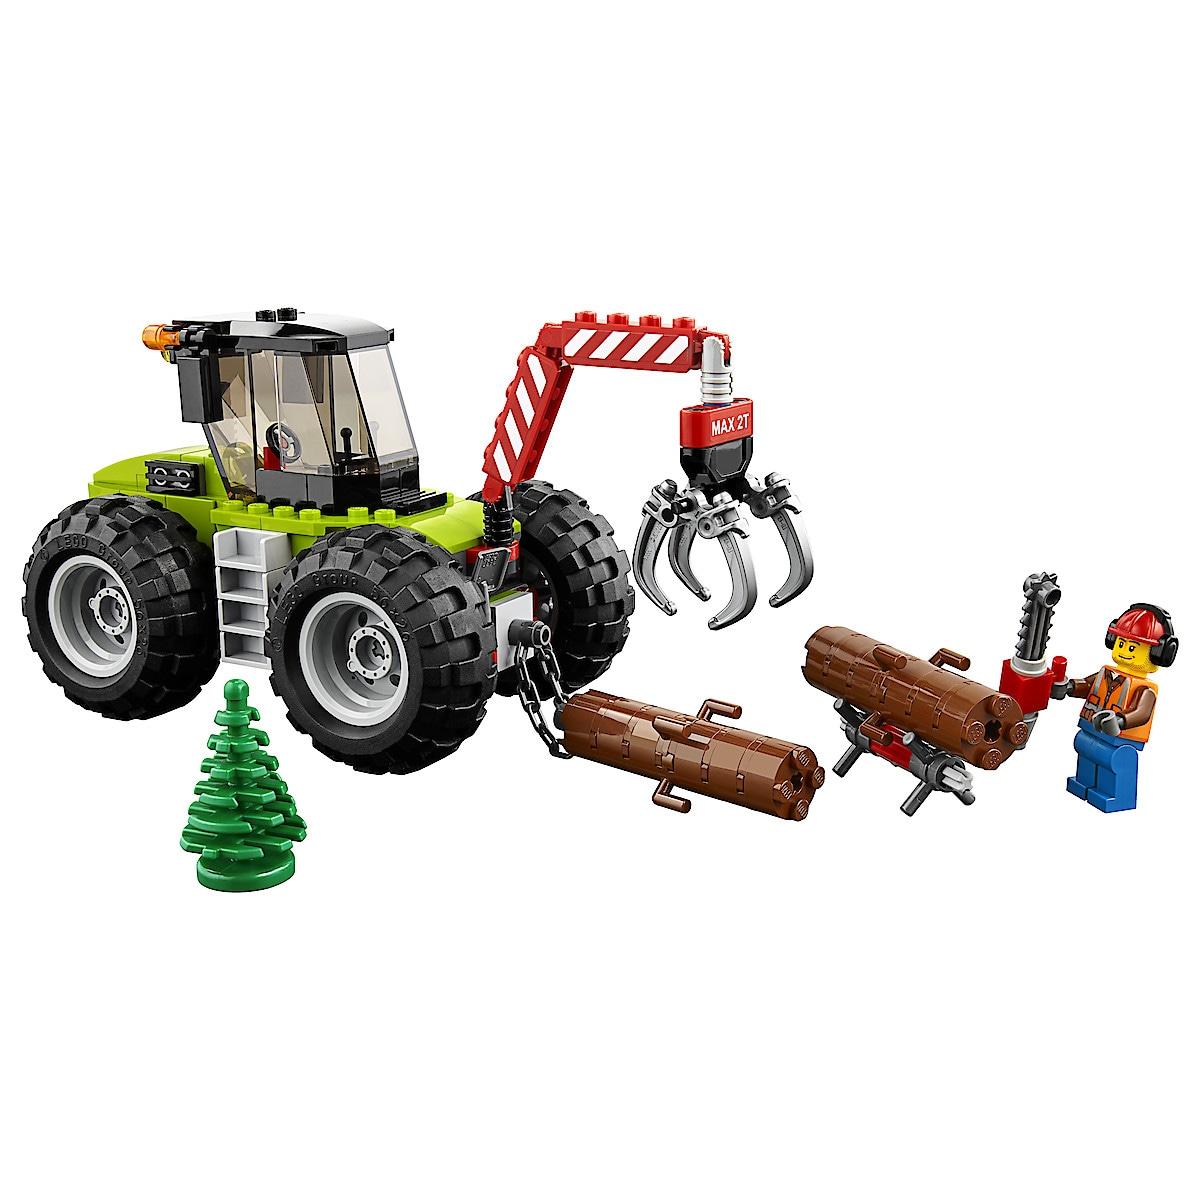 LEGO City Great Vehicles 60181, skogstraktor